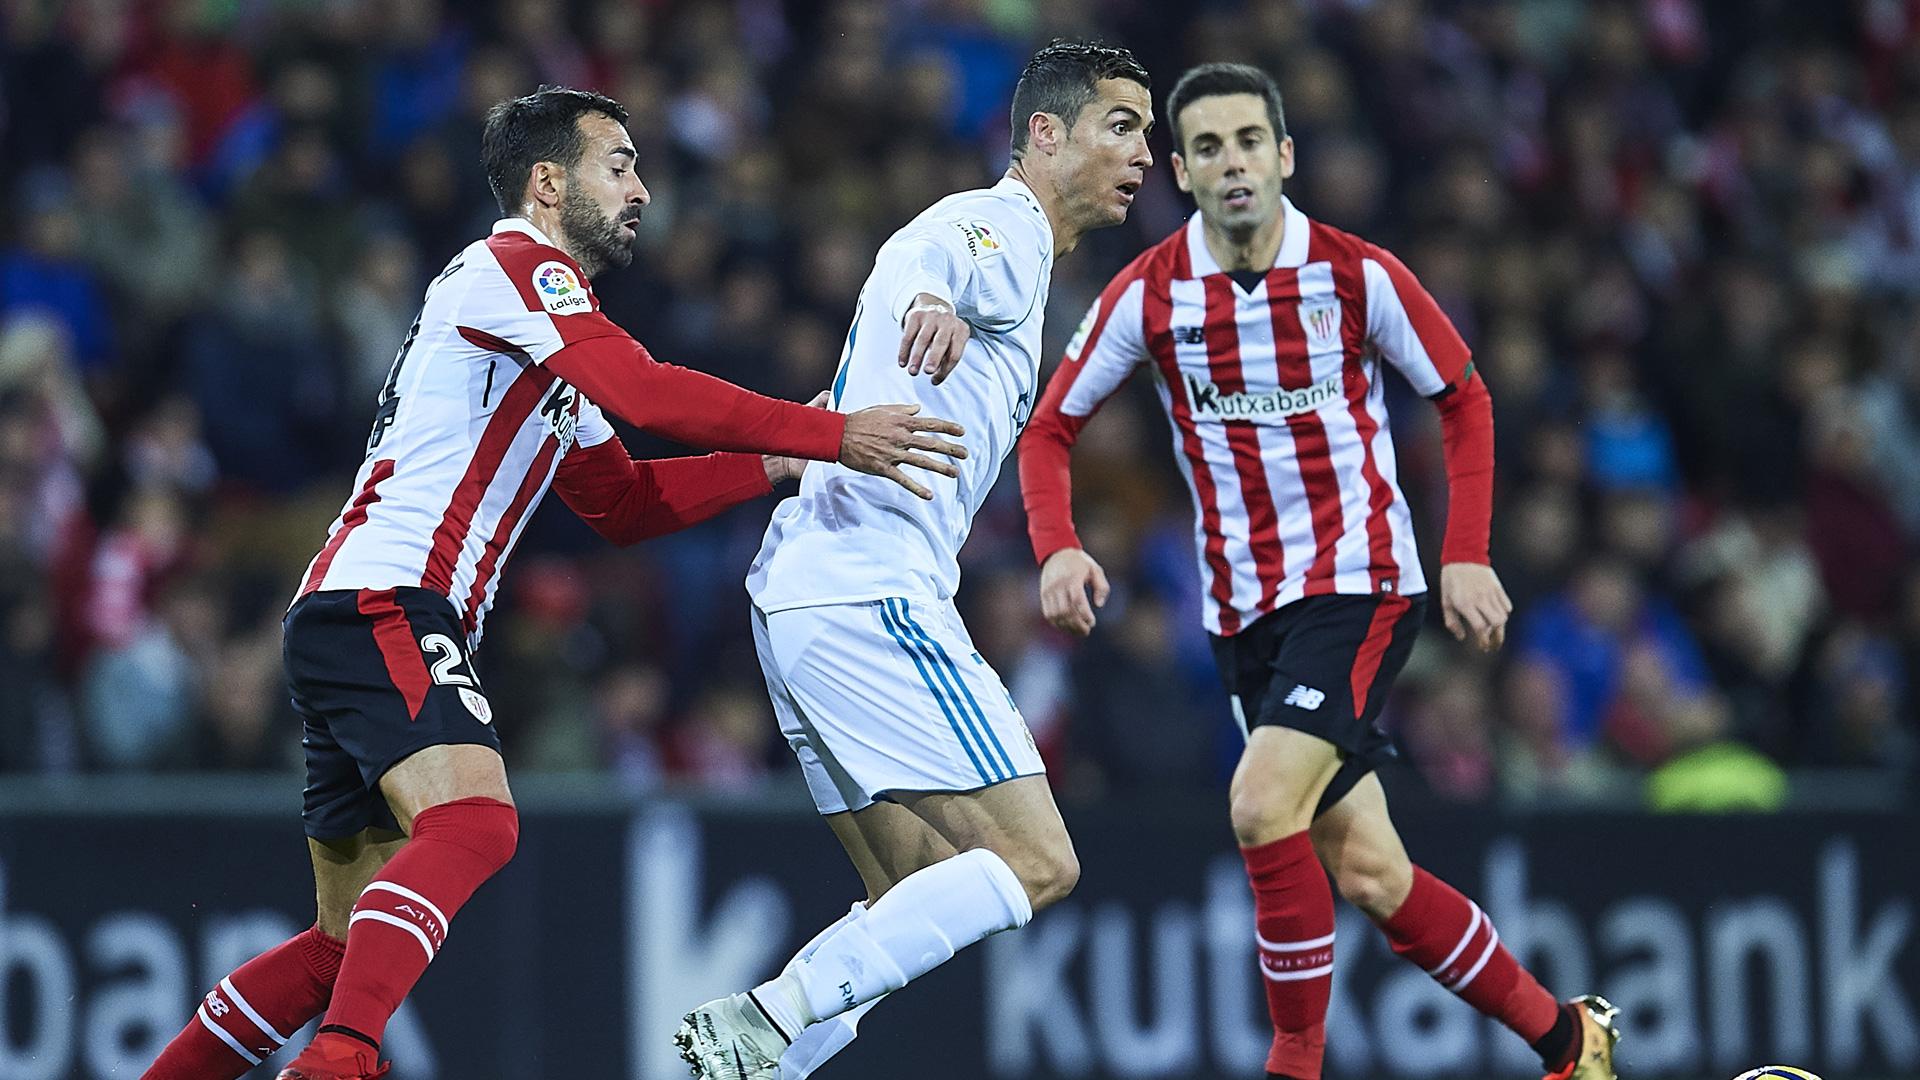 Ronaldo-bilbao-02122017